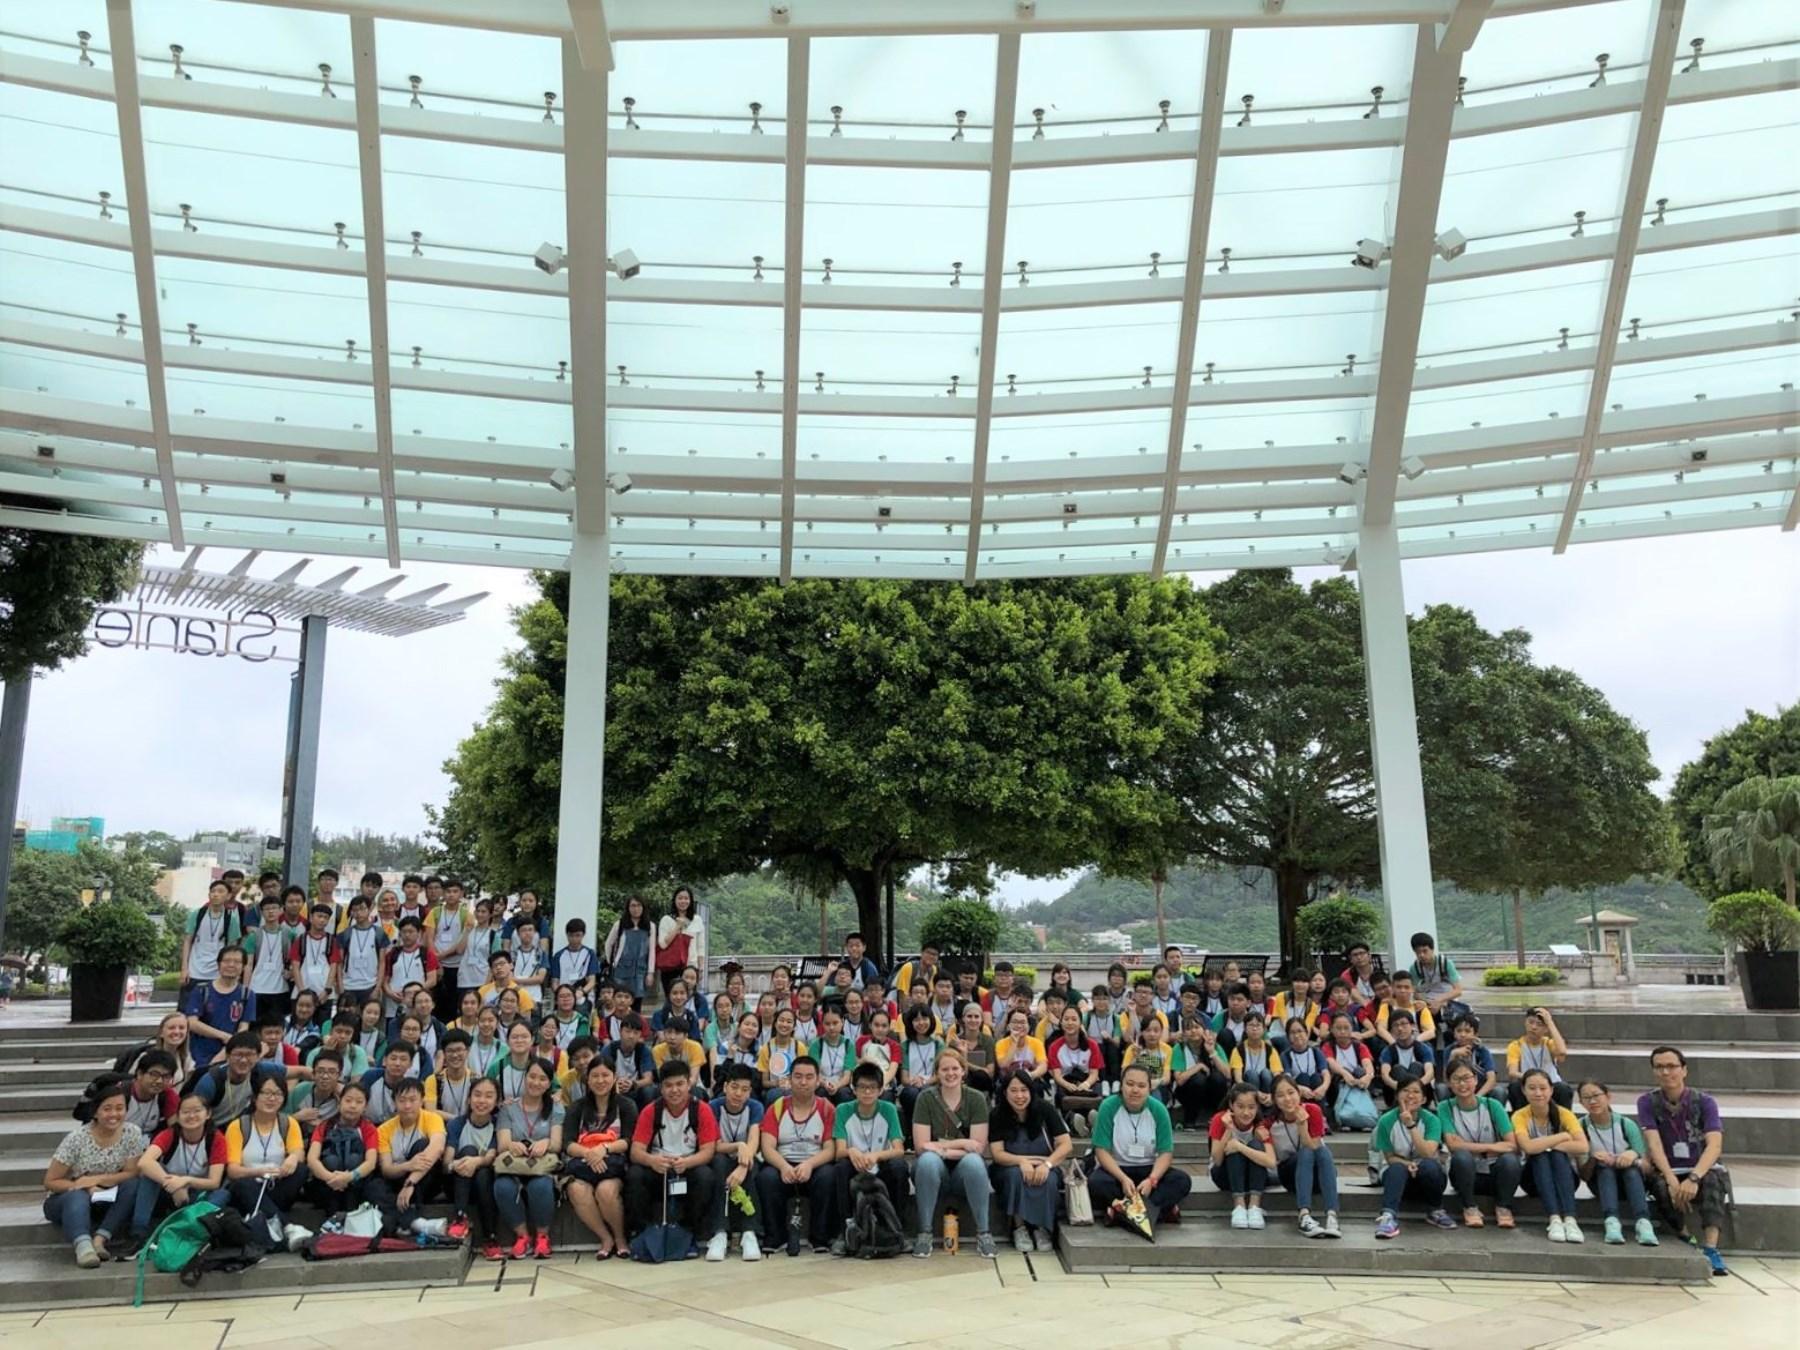 http://npc.edu.hk/sites/default/files/ff45710e-ae33-4938-85de-11783d144163.jpeg